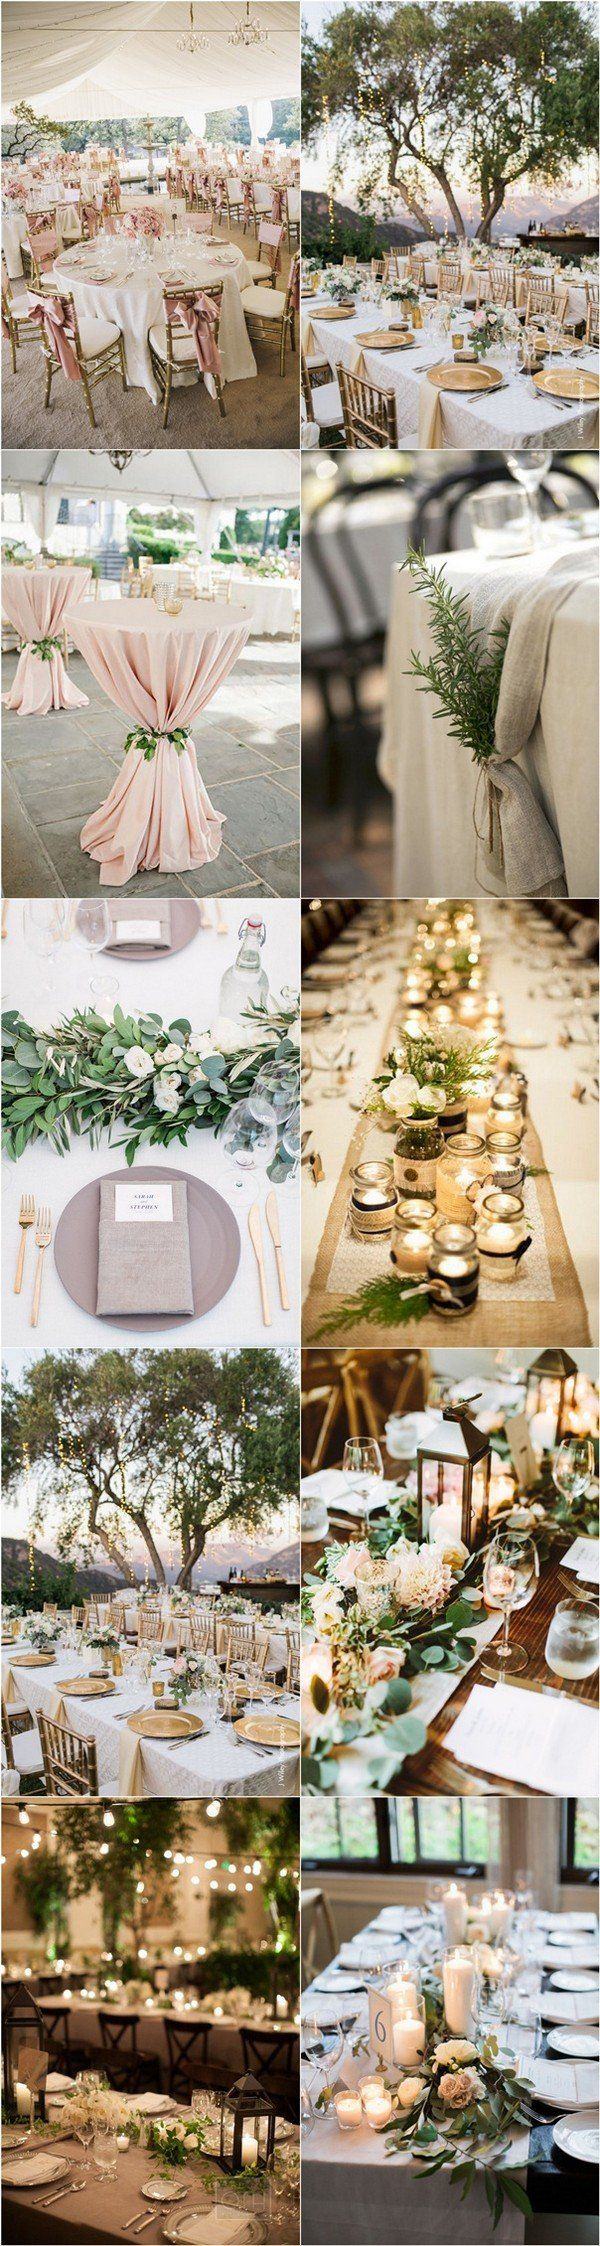 Diy wedding table decorations ideas   Brilliant Wedding Table Decoration Ideas  Wedding  Pinterest